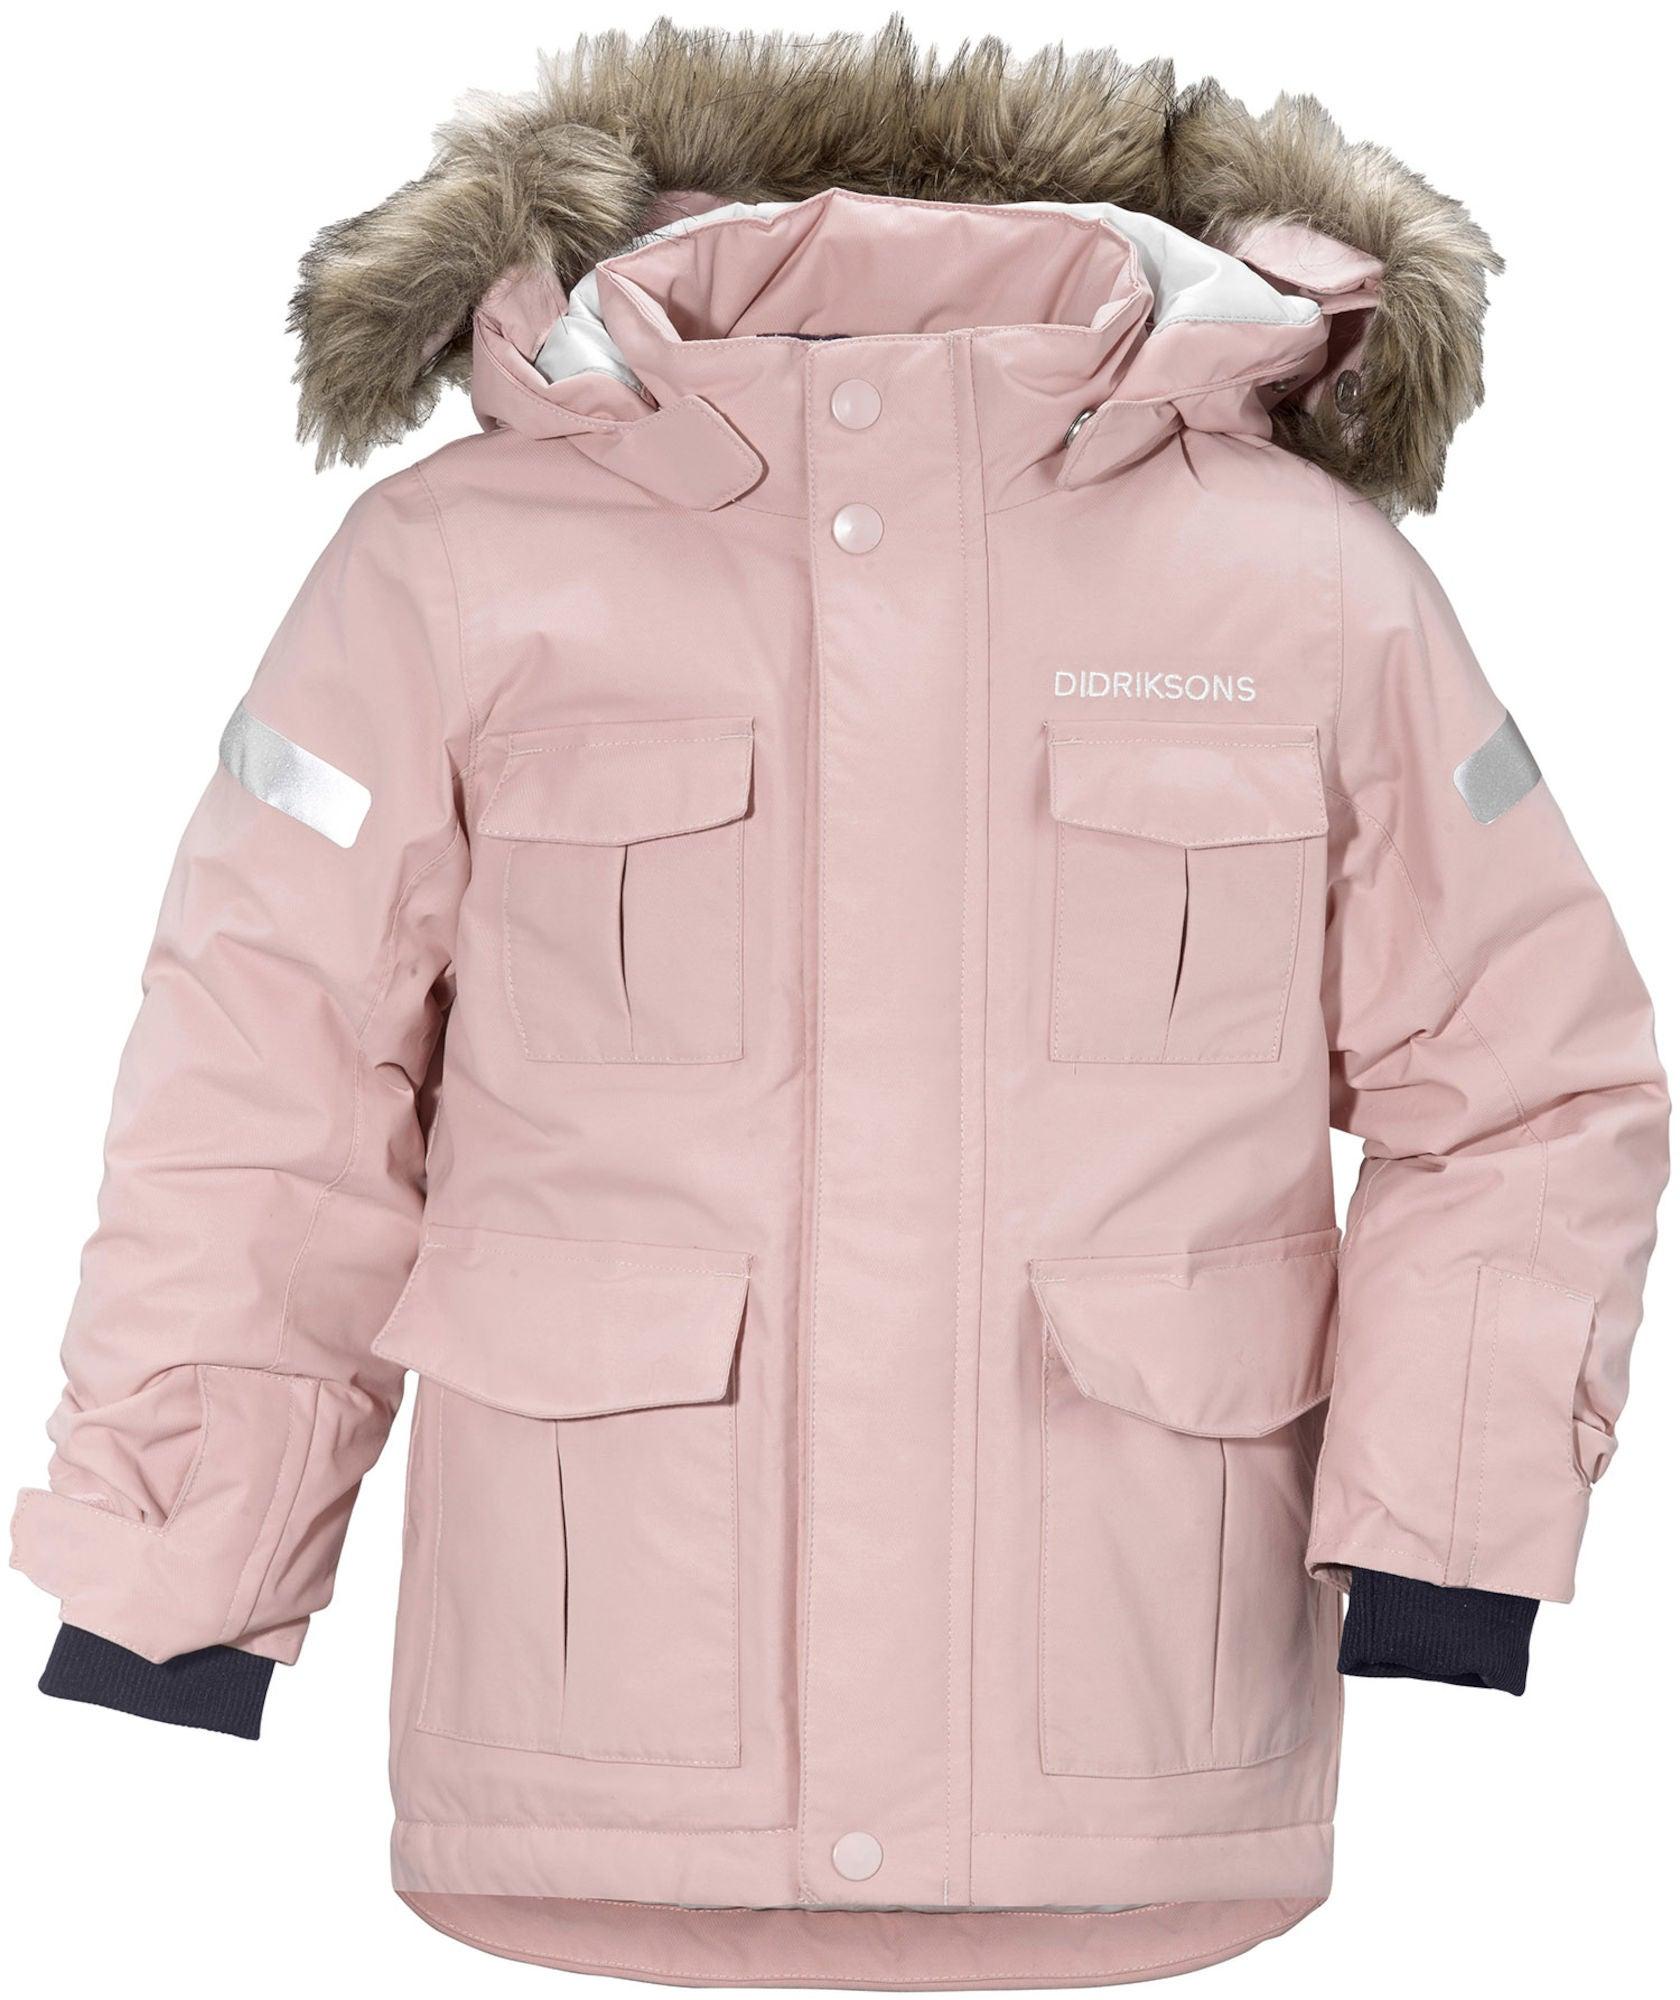 Köp Didriksons Nokosi Parka, Dusty Pink | Jollyroom